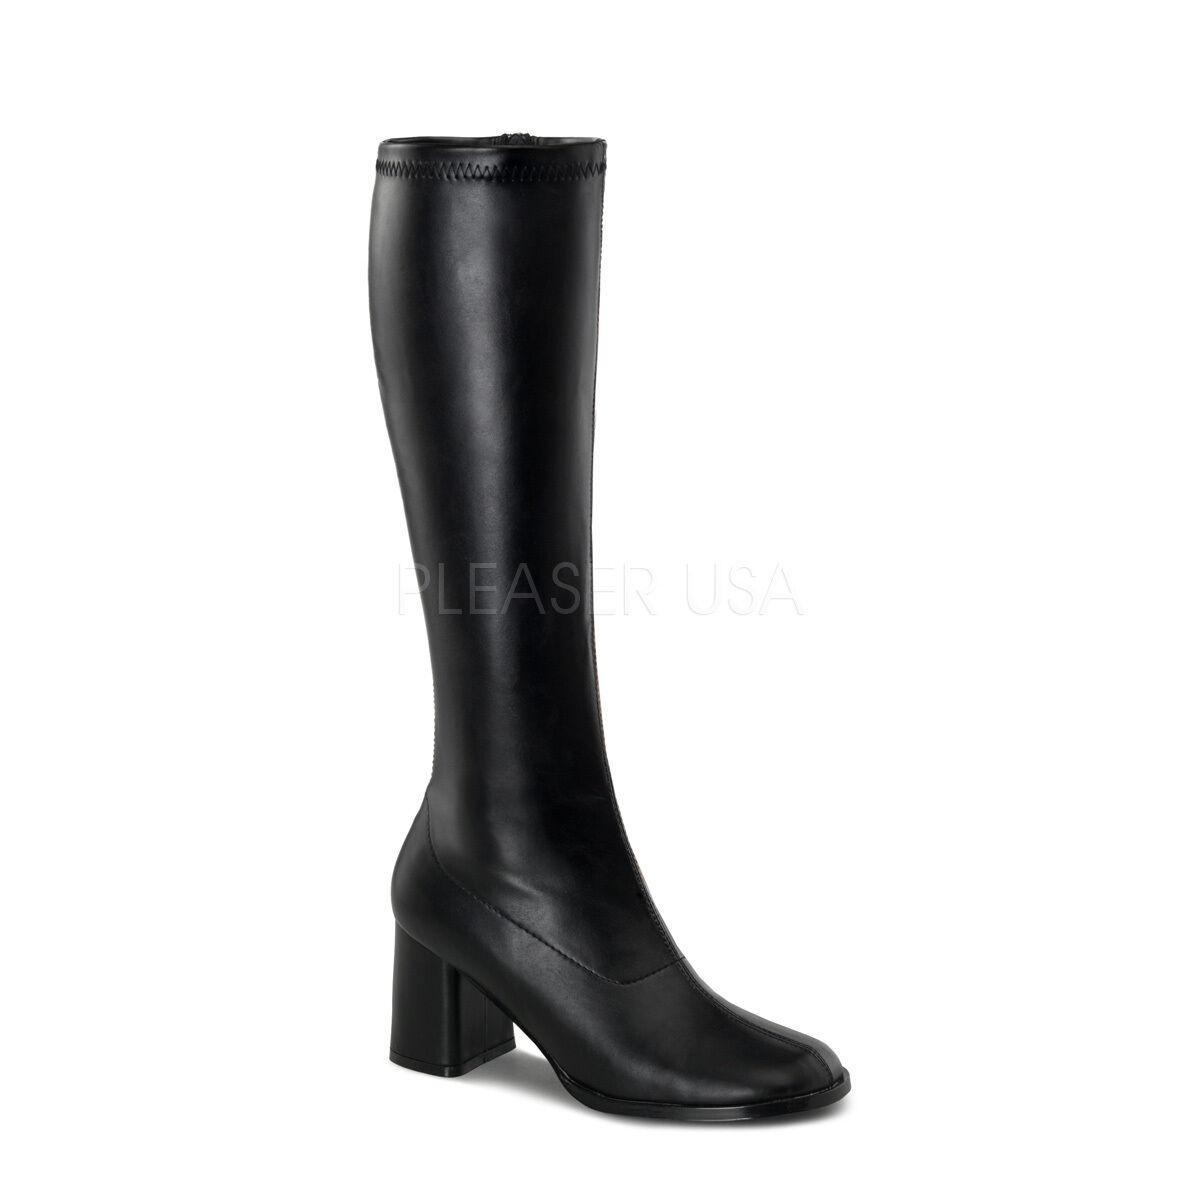 Vestido de lujo Pleaser Funtasma Funtasma Funtasma Gogo - 300 Negro PU Elastizado 70s Discoteca de la rodilla botas altas  buen precio